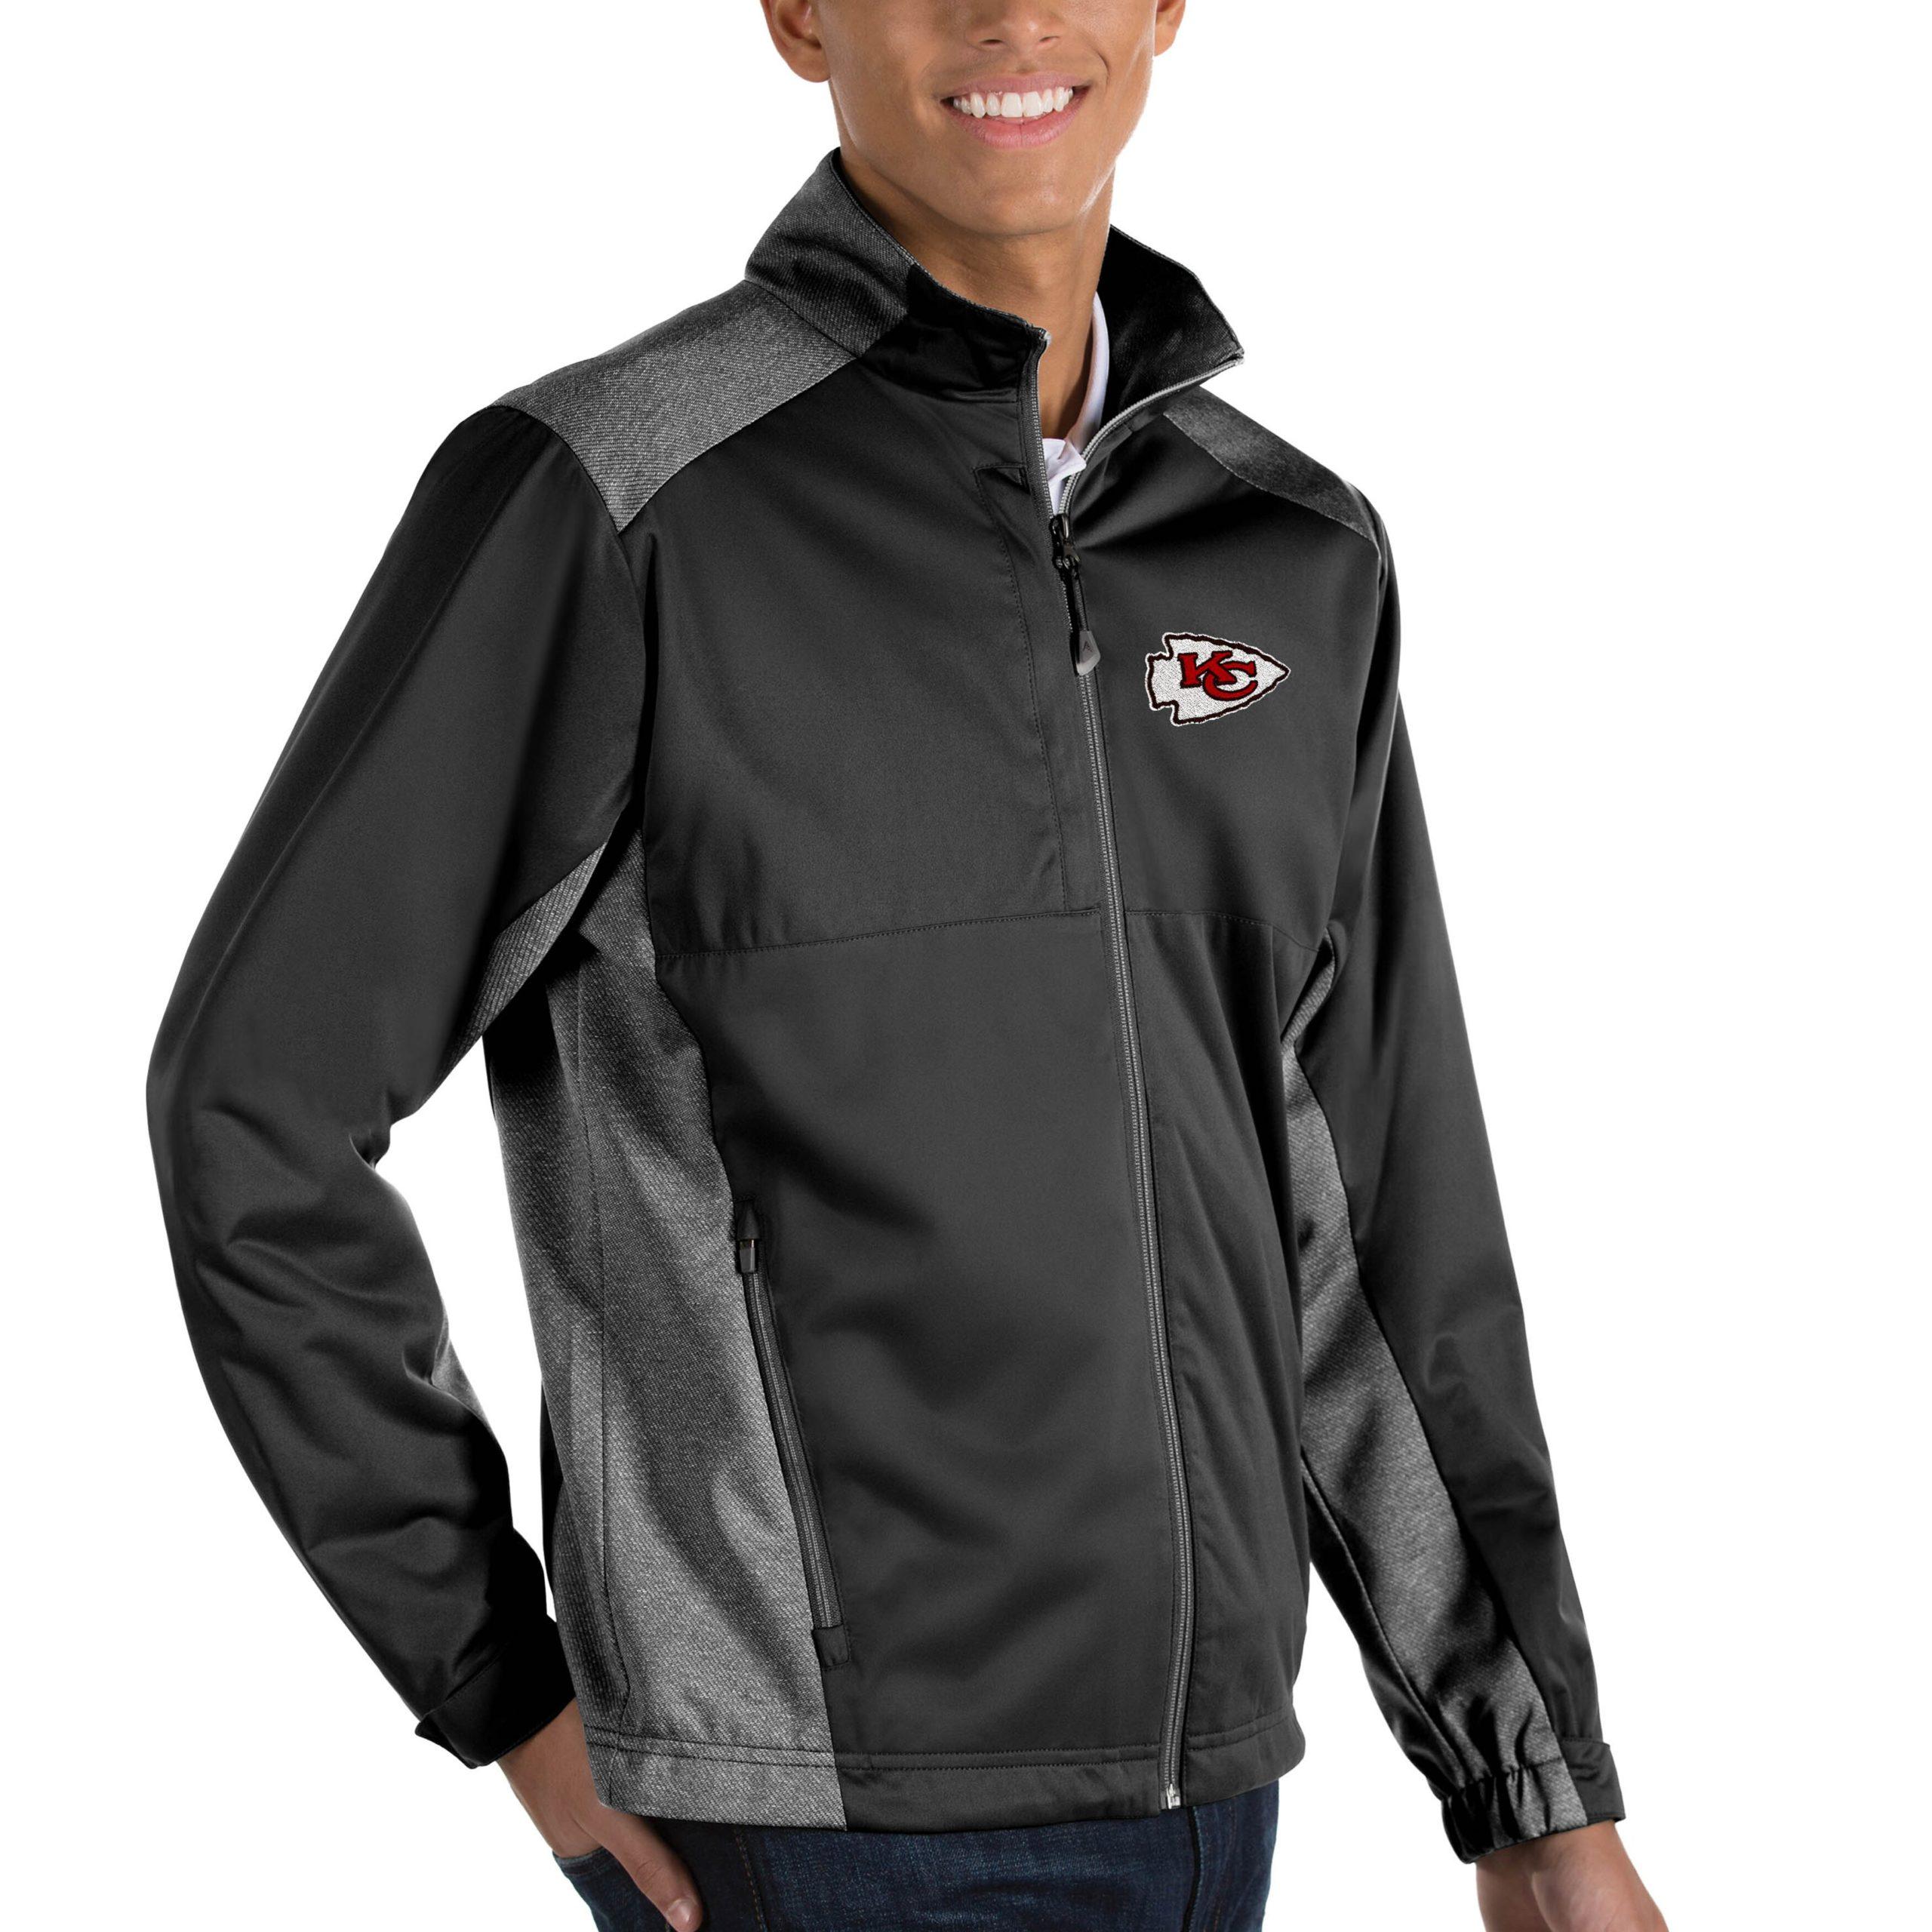 Kansas City Chiefs Antigua Revolve Big & Tall Full-Zip Jacket - Heather Black